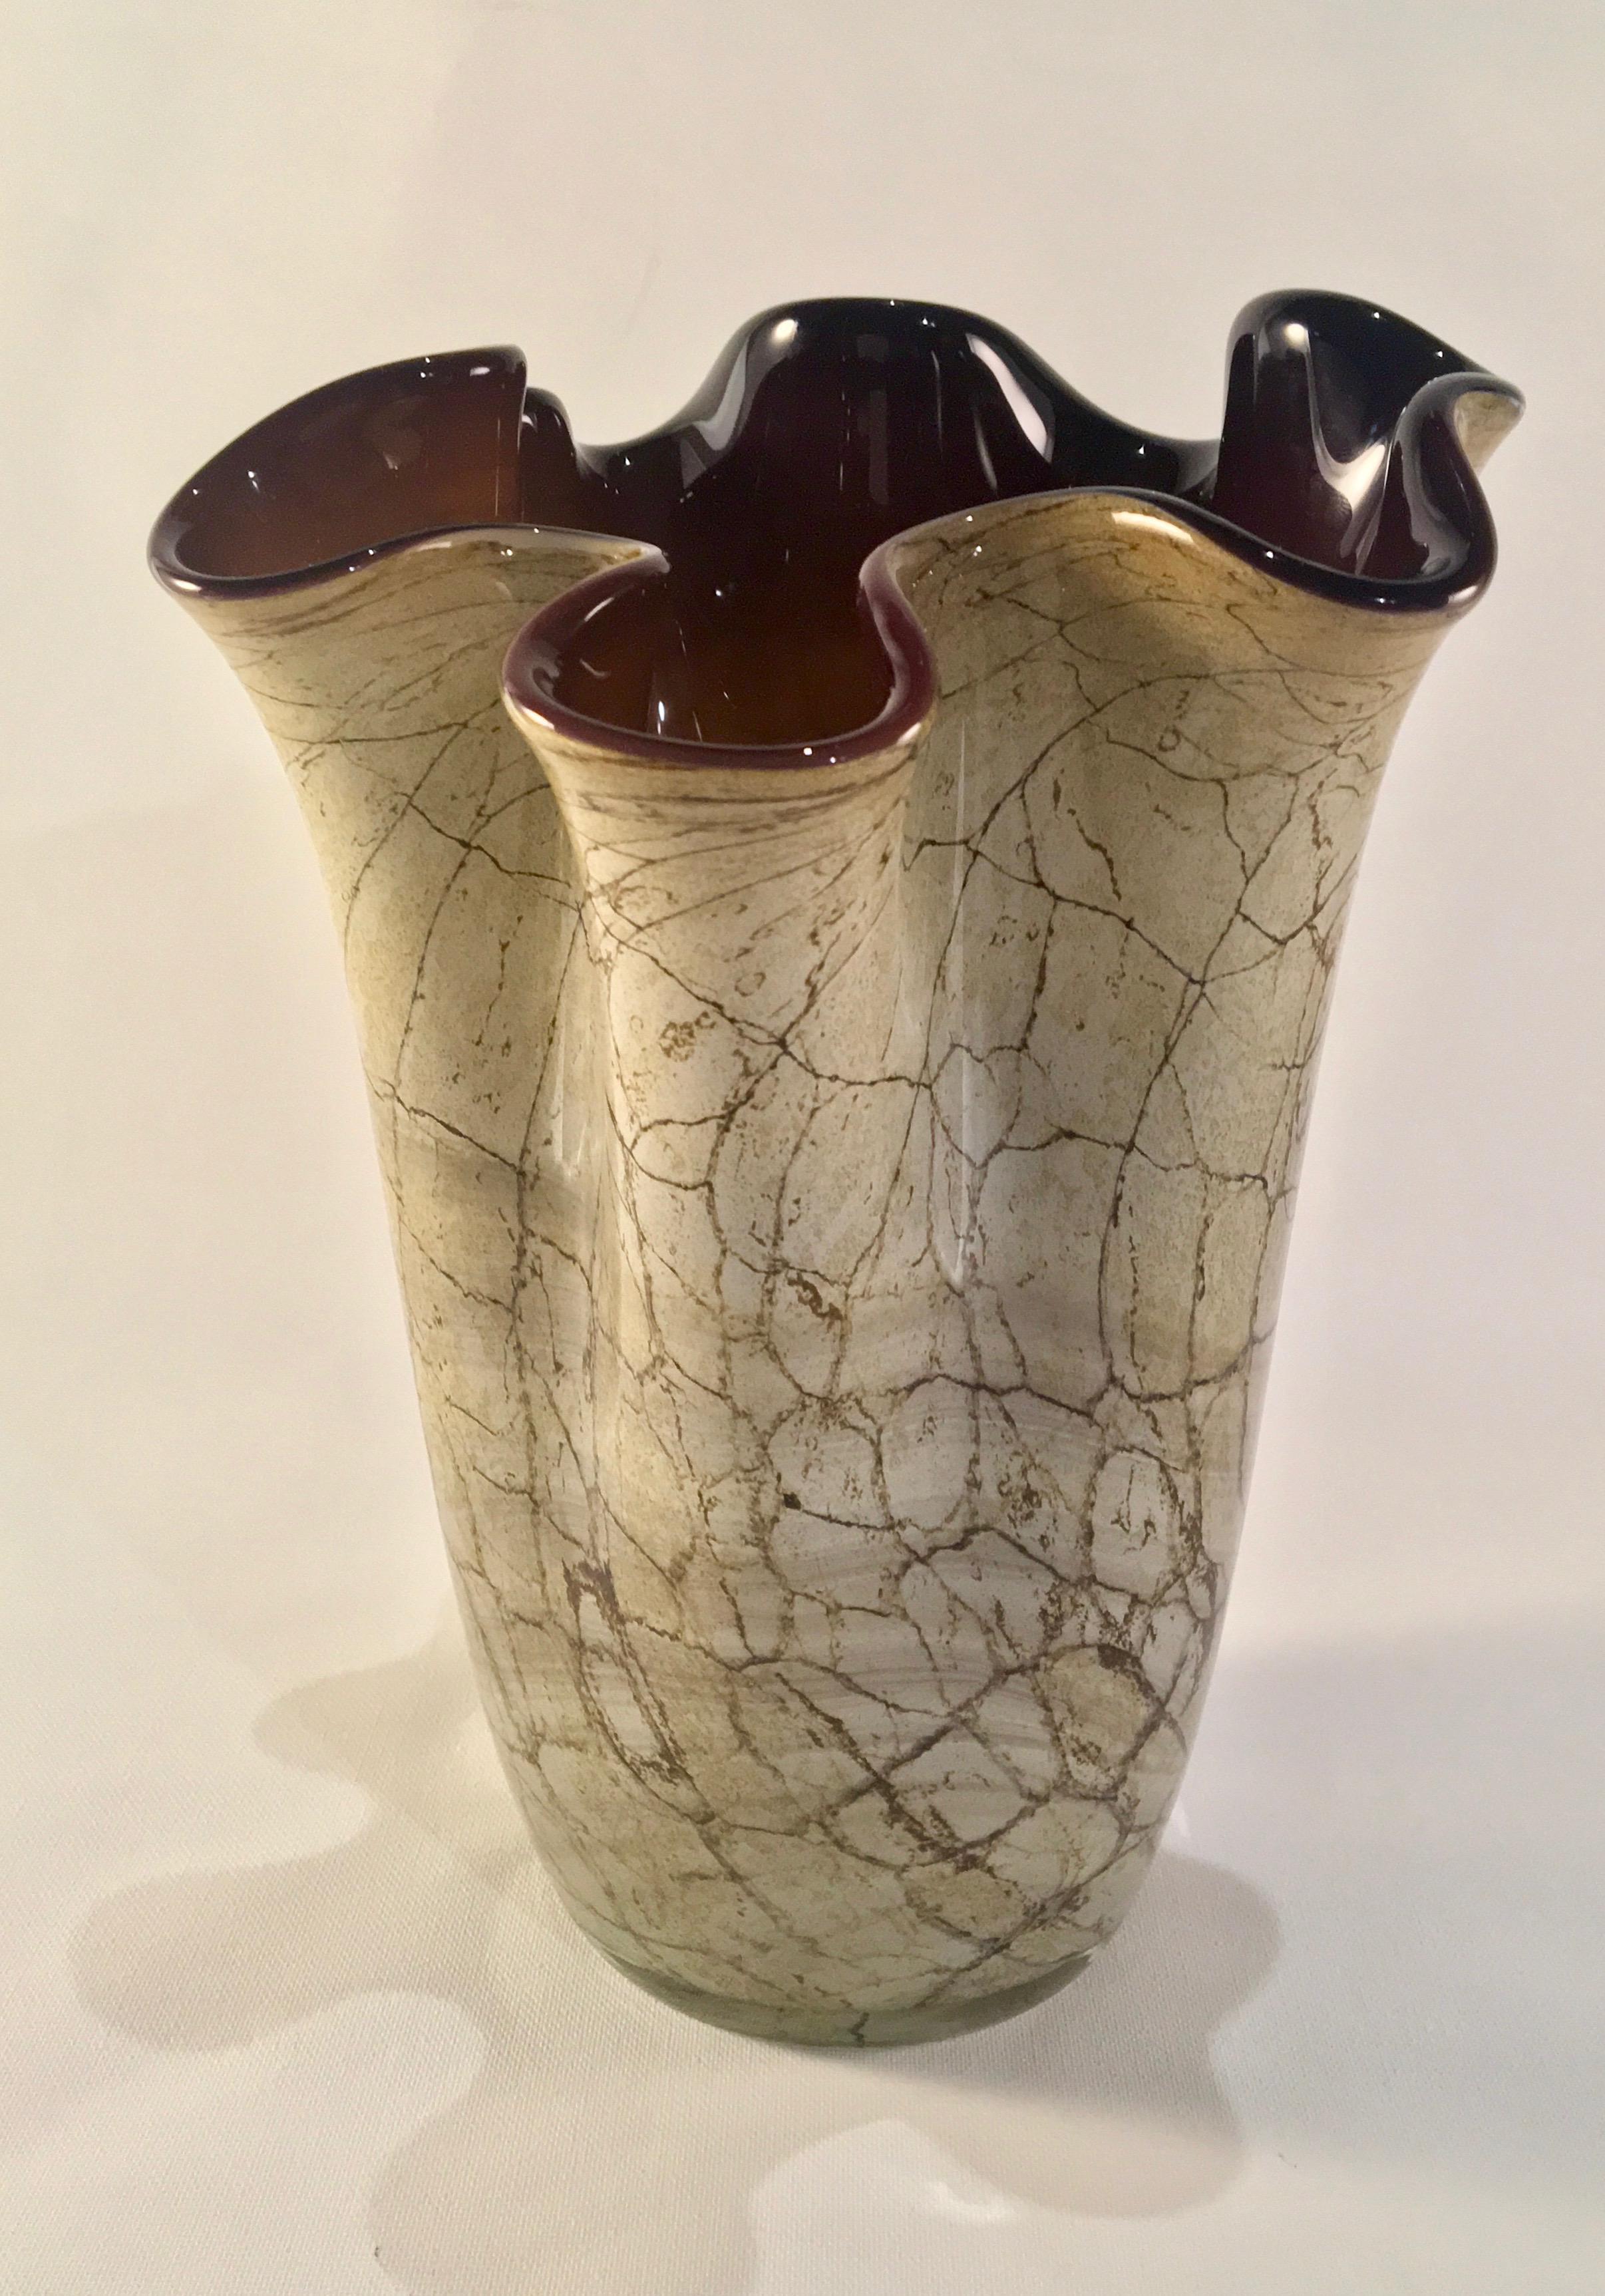 Vintage Jozefina Krosno Handkerchief Vase in Hand-Blown ... Ruffled Handkerchief Glass Vases Bedford, A